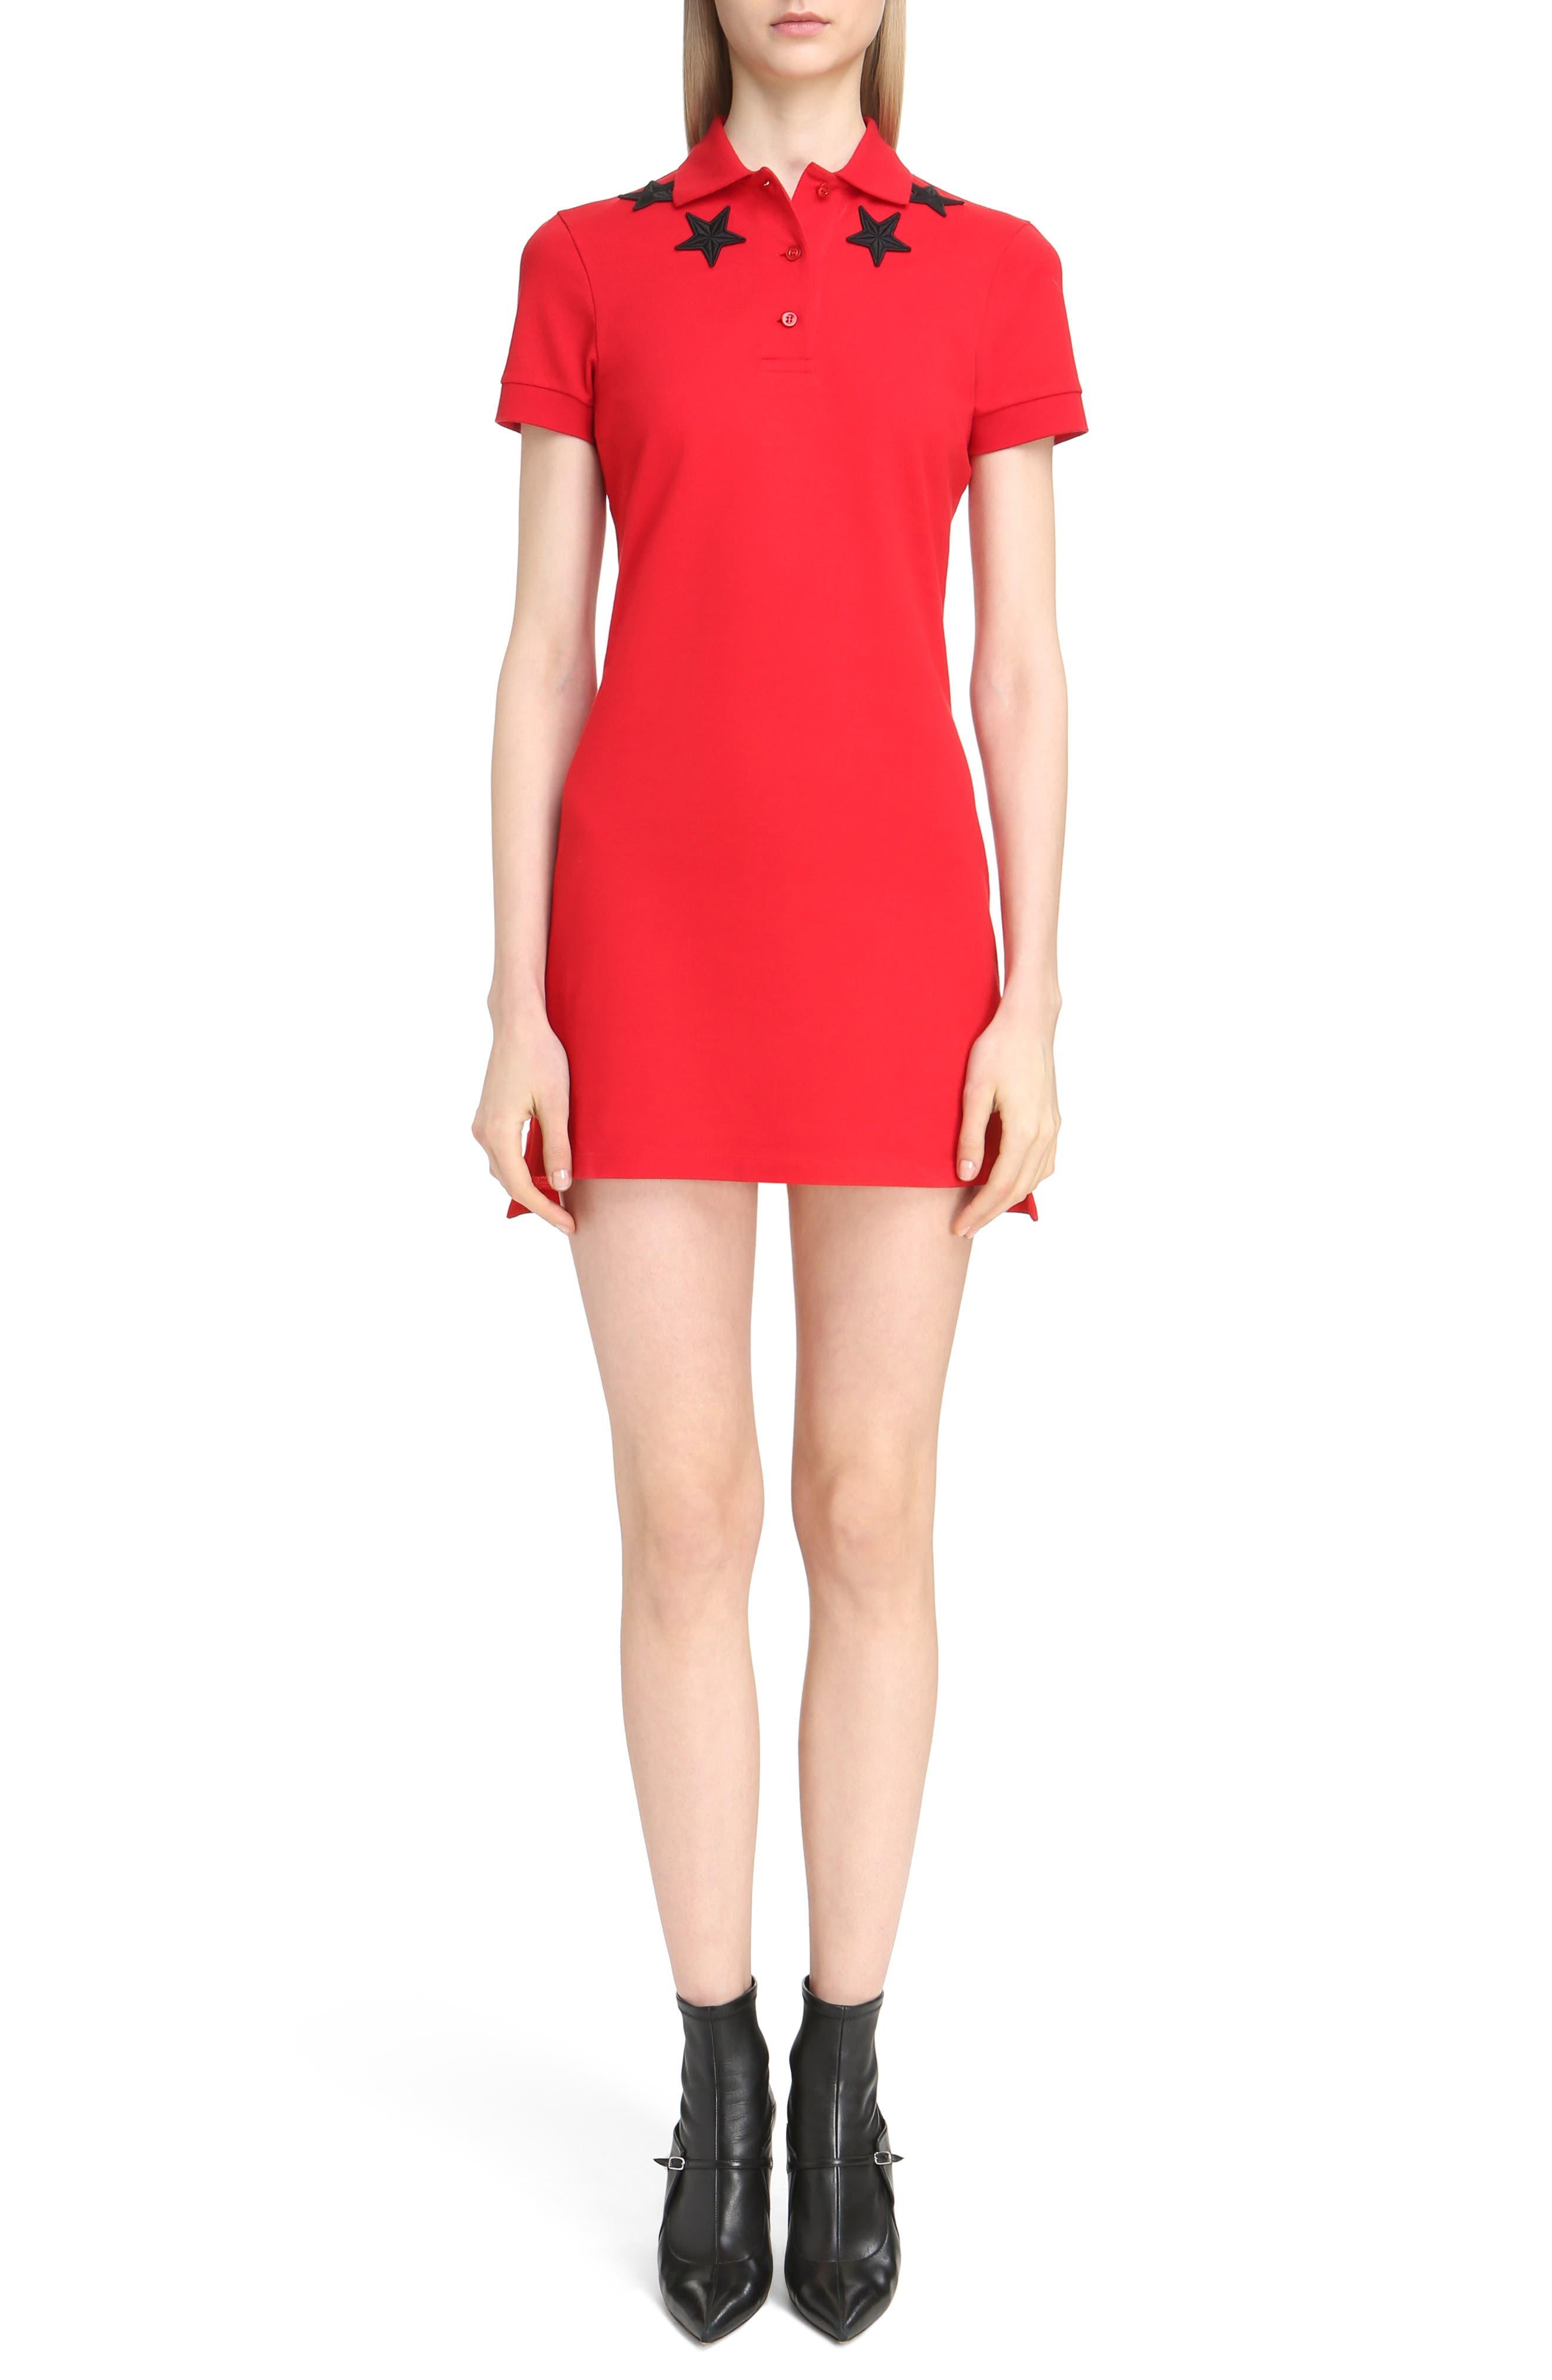 Star Embellished Polo Dress,                         Main,                         color, Red/ Black